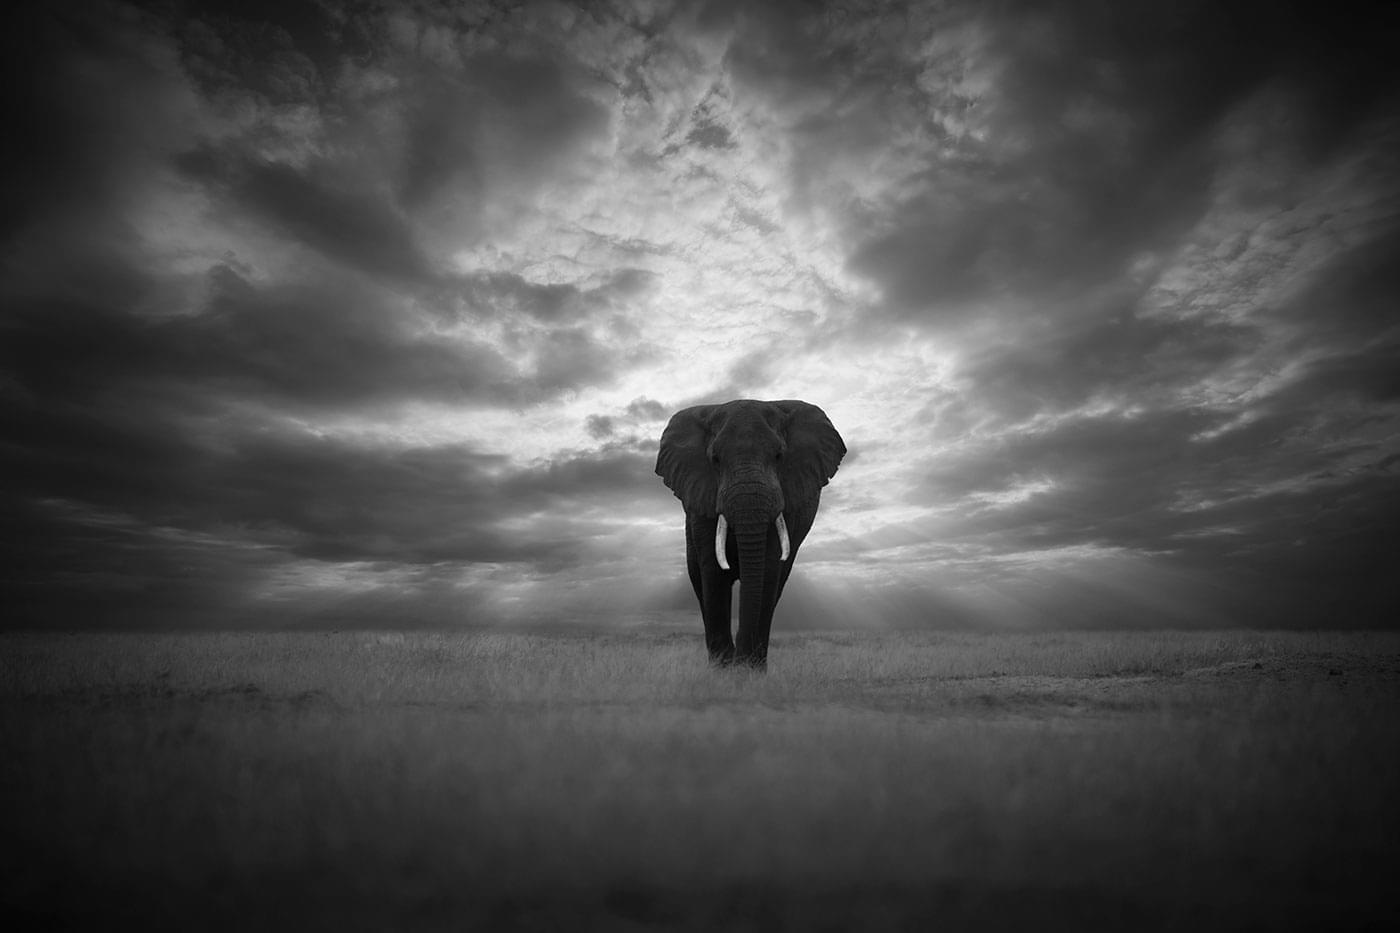 björn persson fotograf